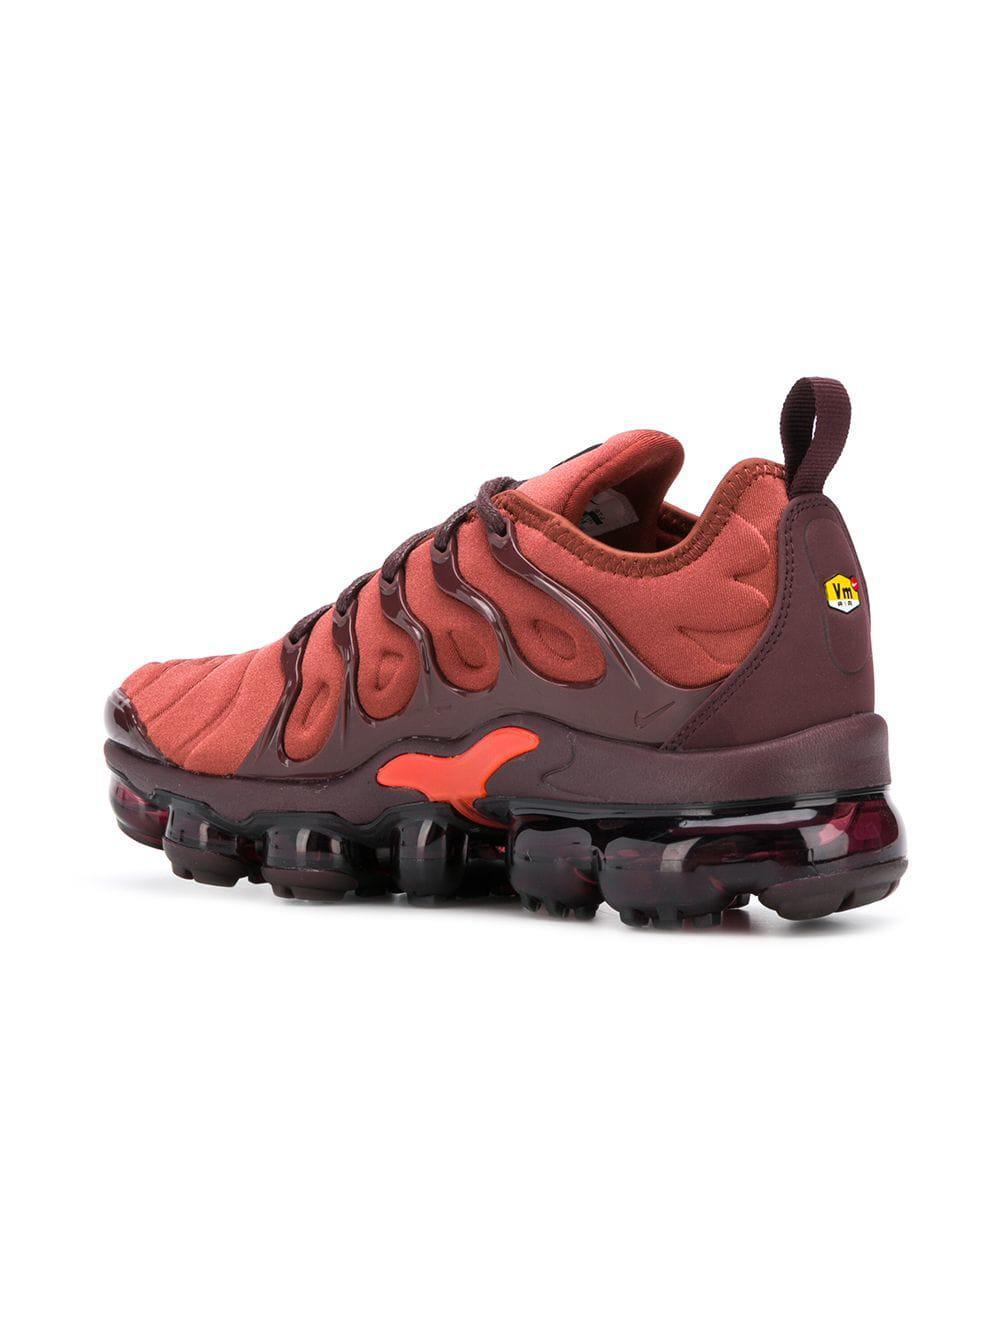 Nike - Orange Air Vapormax Plus Sneakers - Lyst. View fullscreen a91b8f72f